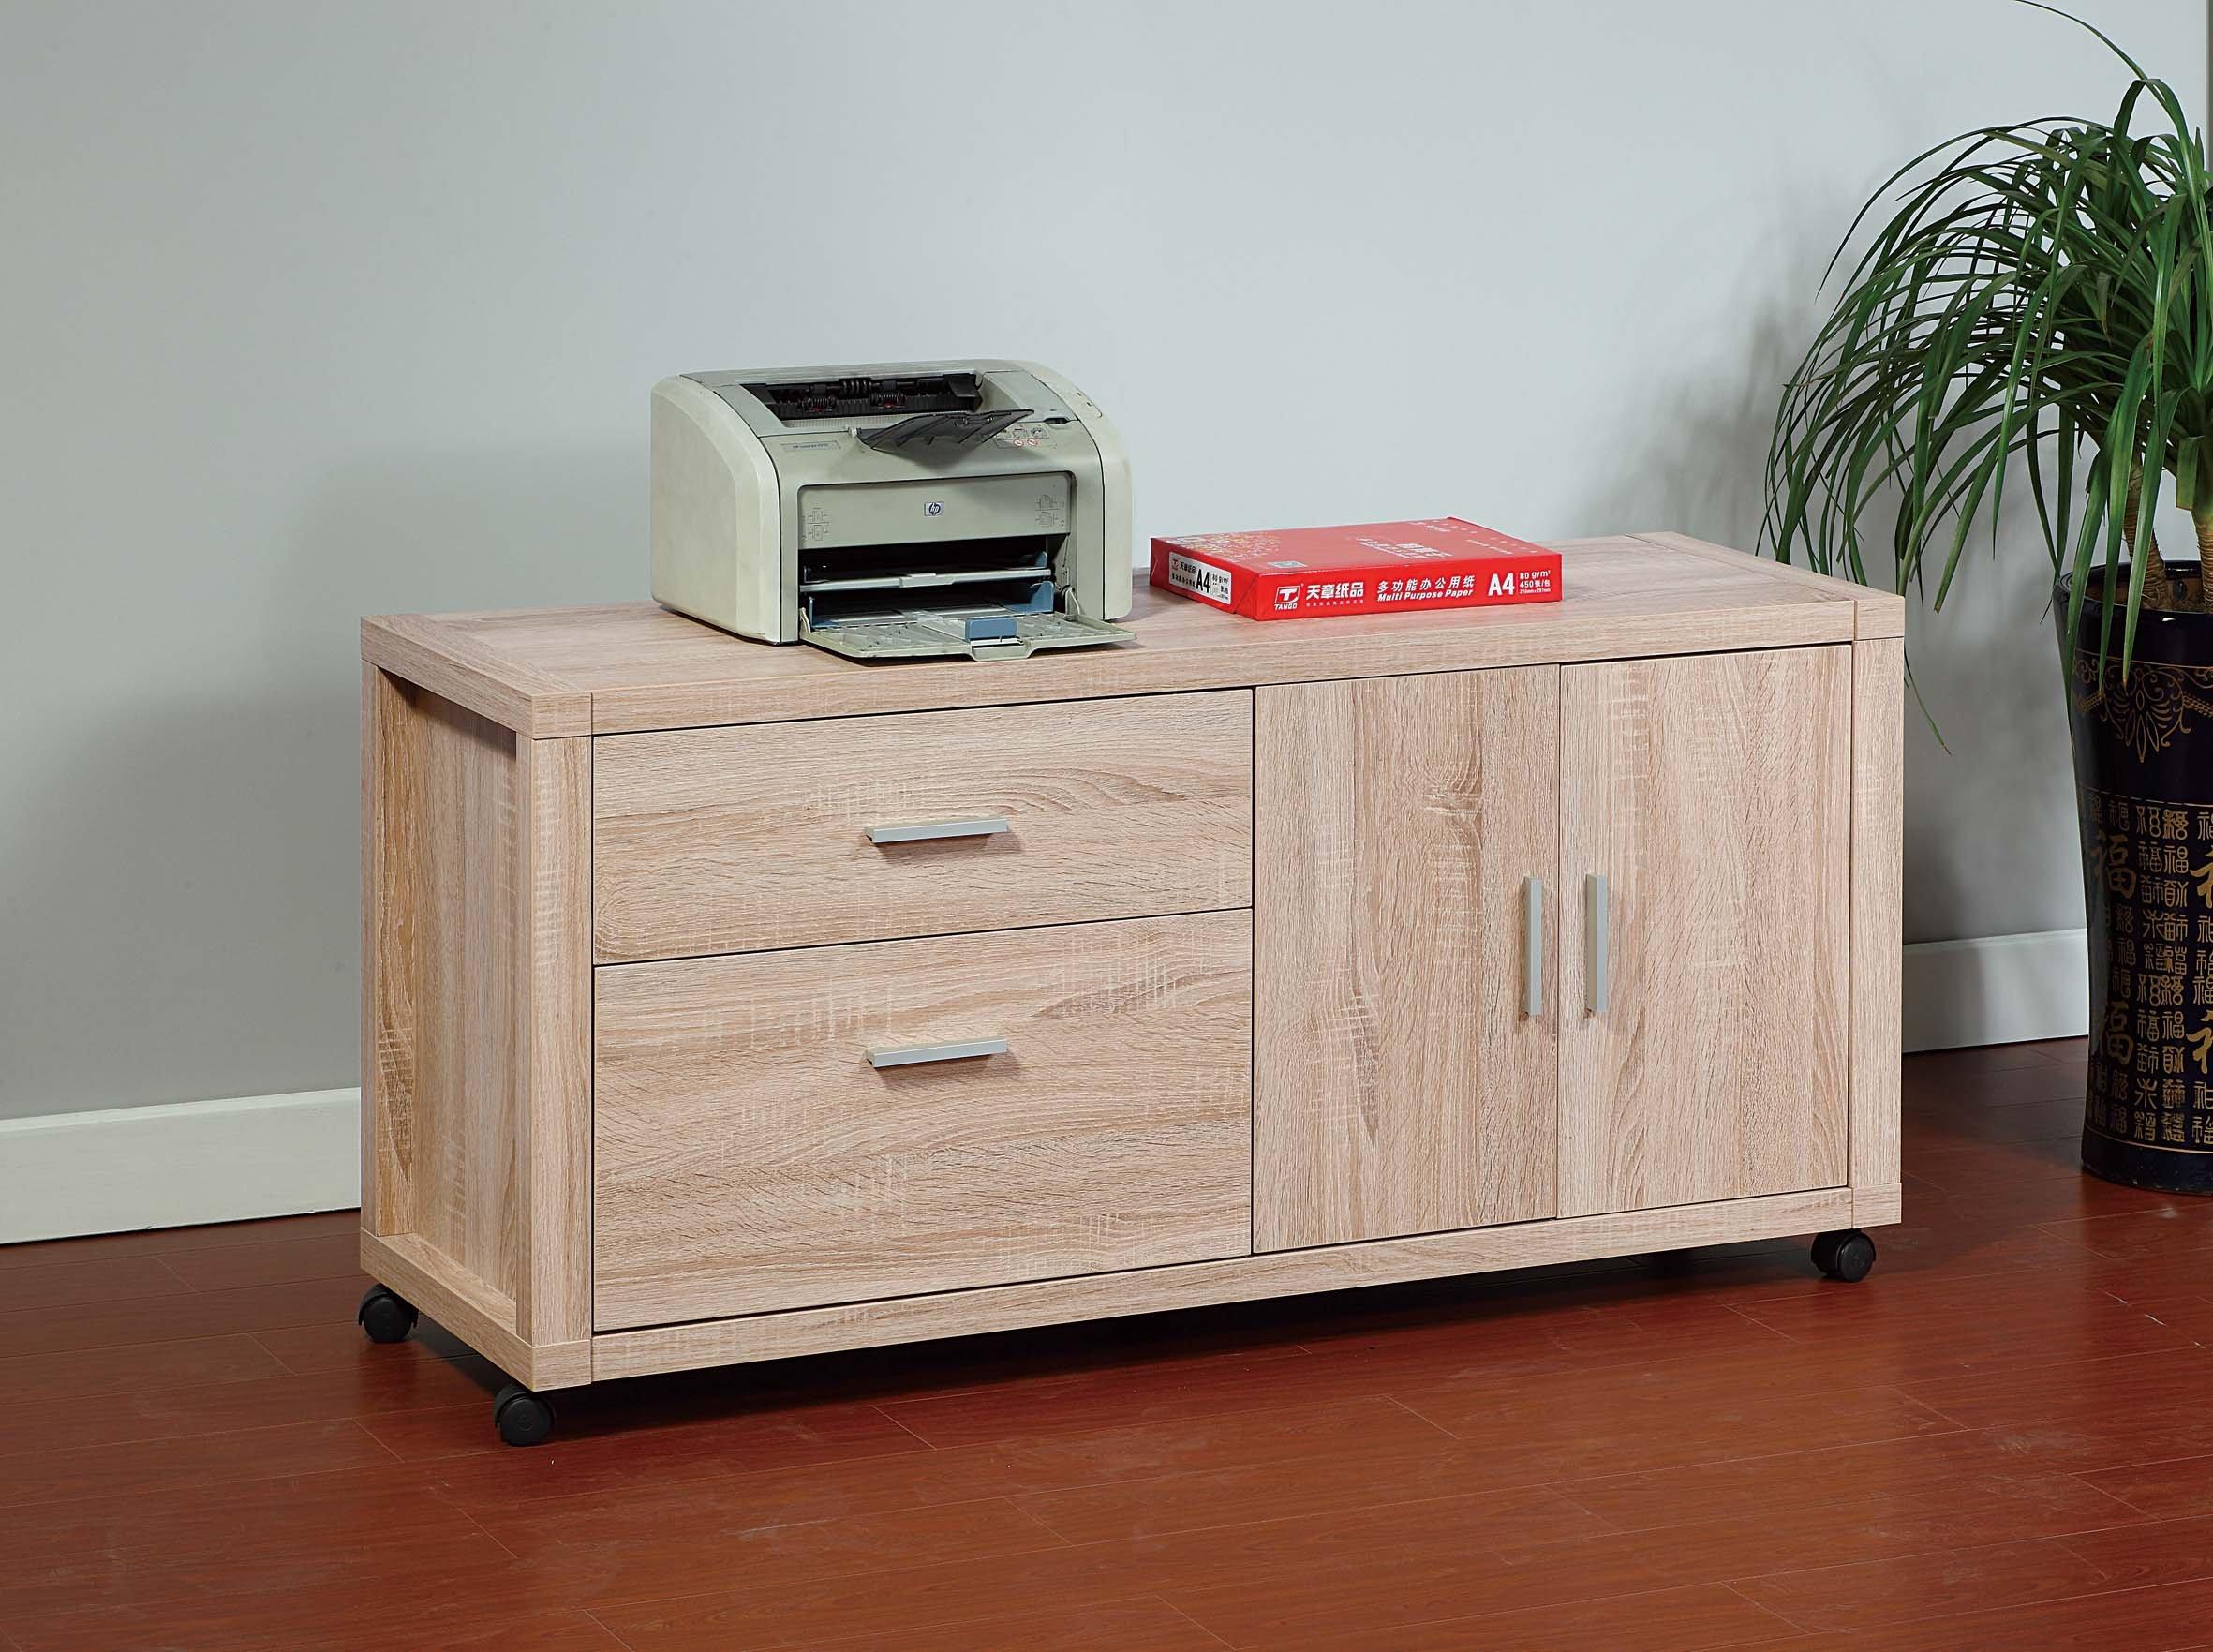 Smart Home 14940 Attwell File Credenza Mobile File Cabinet Organizer (Weathered White)